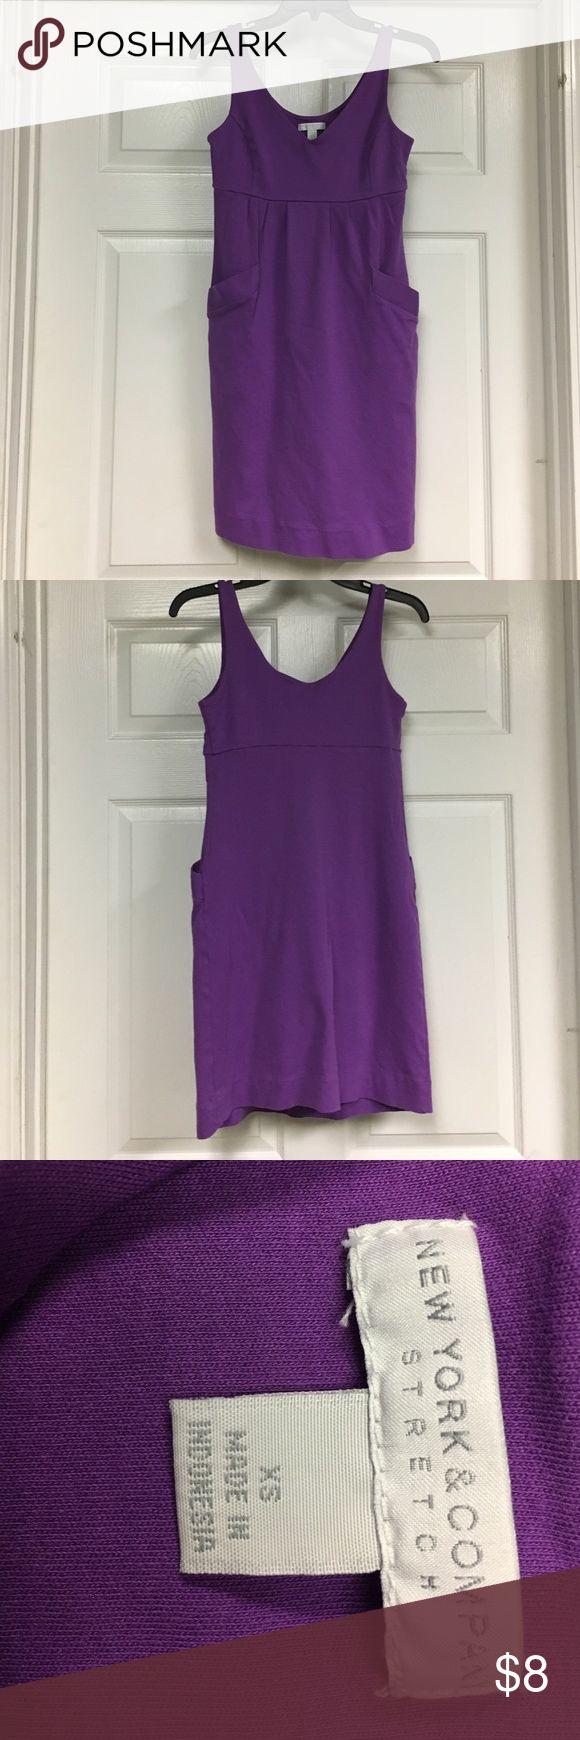 New York & Co purple sundress Purple sundress with side pockets New York & Company Dresses